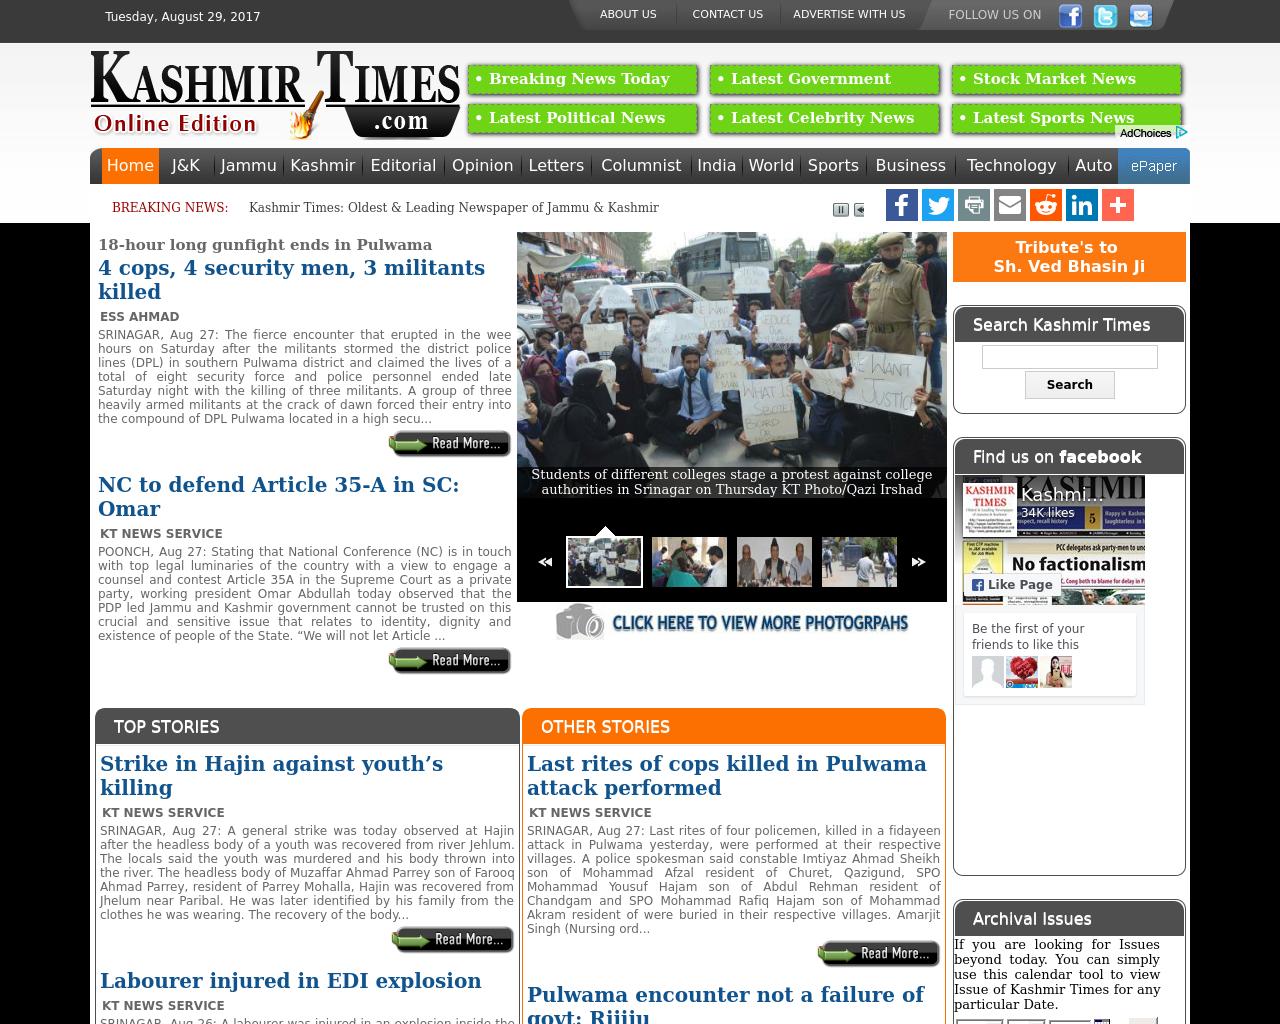 Kashmir-Times-Advertising-Reviews-Pricing